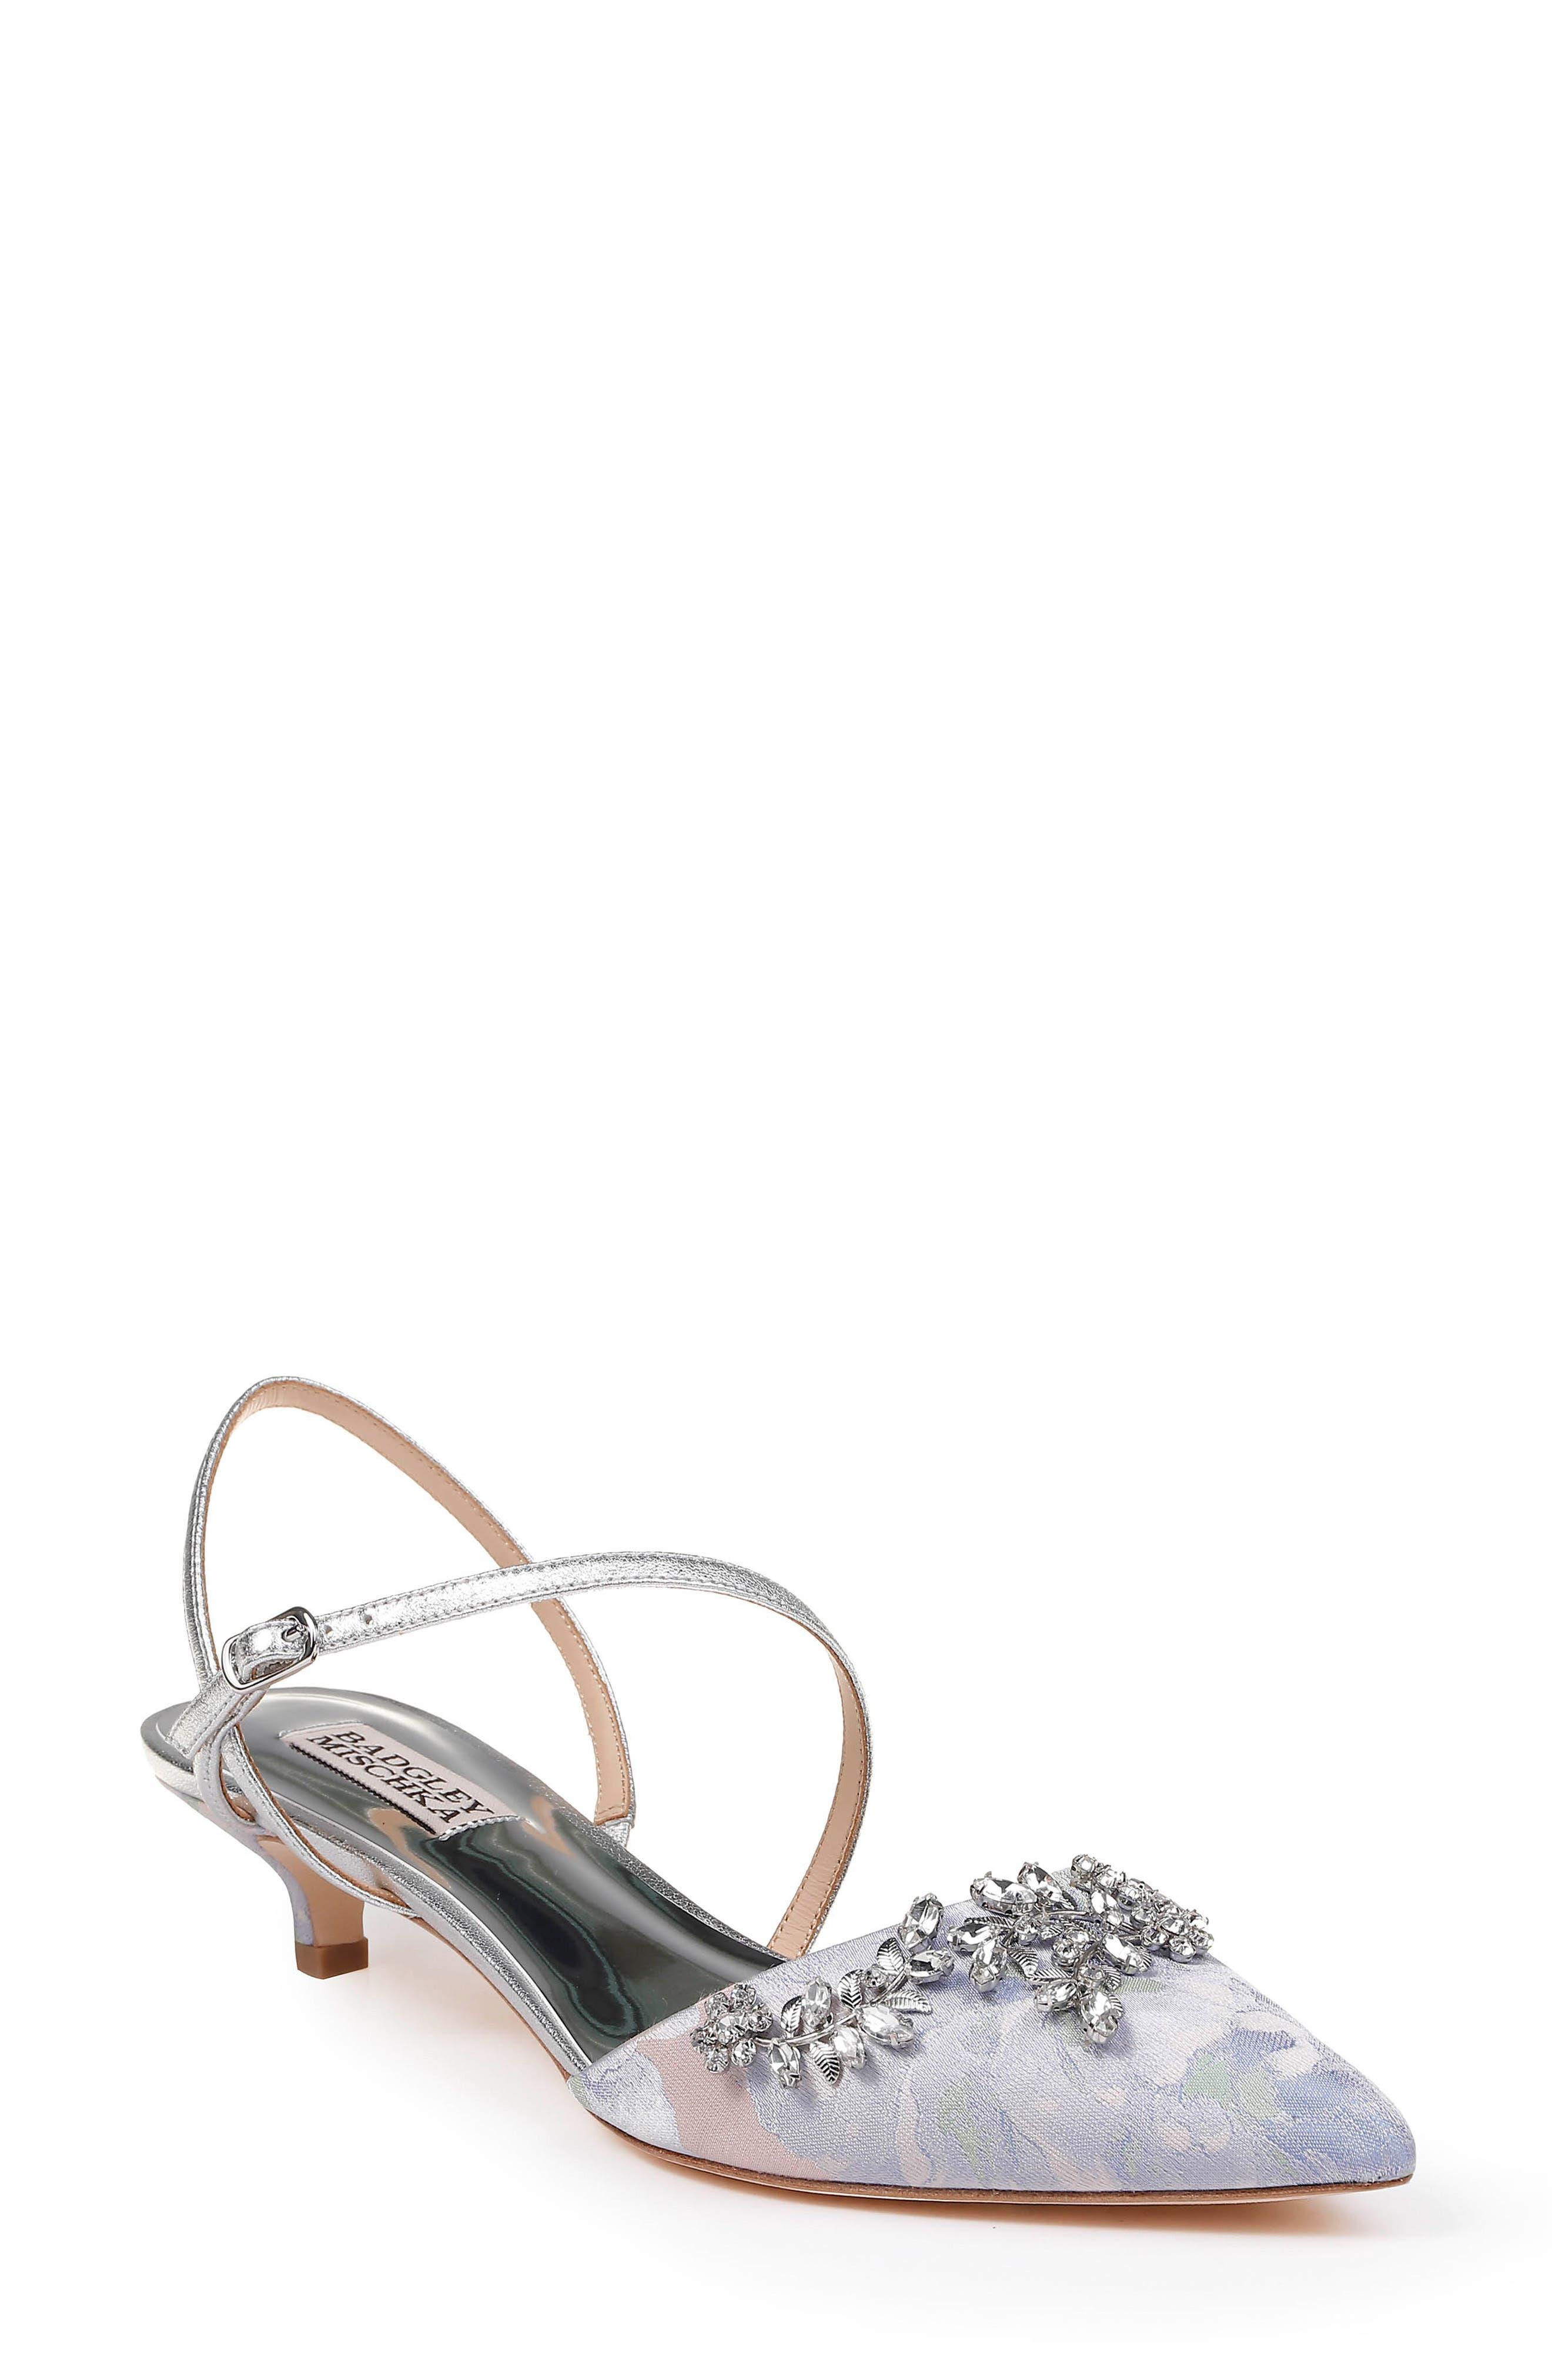 BADGLEY MISCHKA COLLECTION Badgley Mischka Crystal Embellished Quarter Strap Pump, Main, color, POWDER MULTI FABRIC